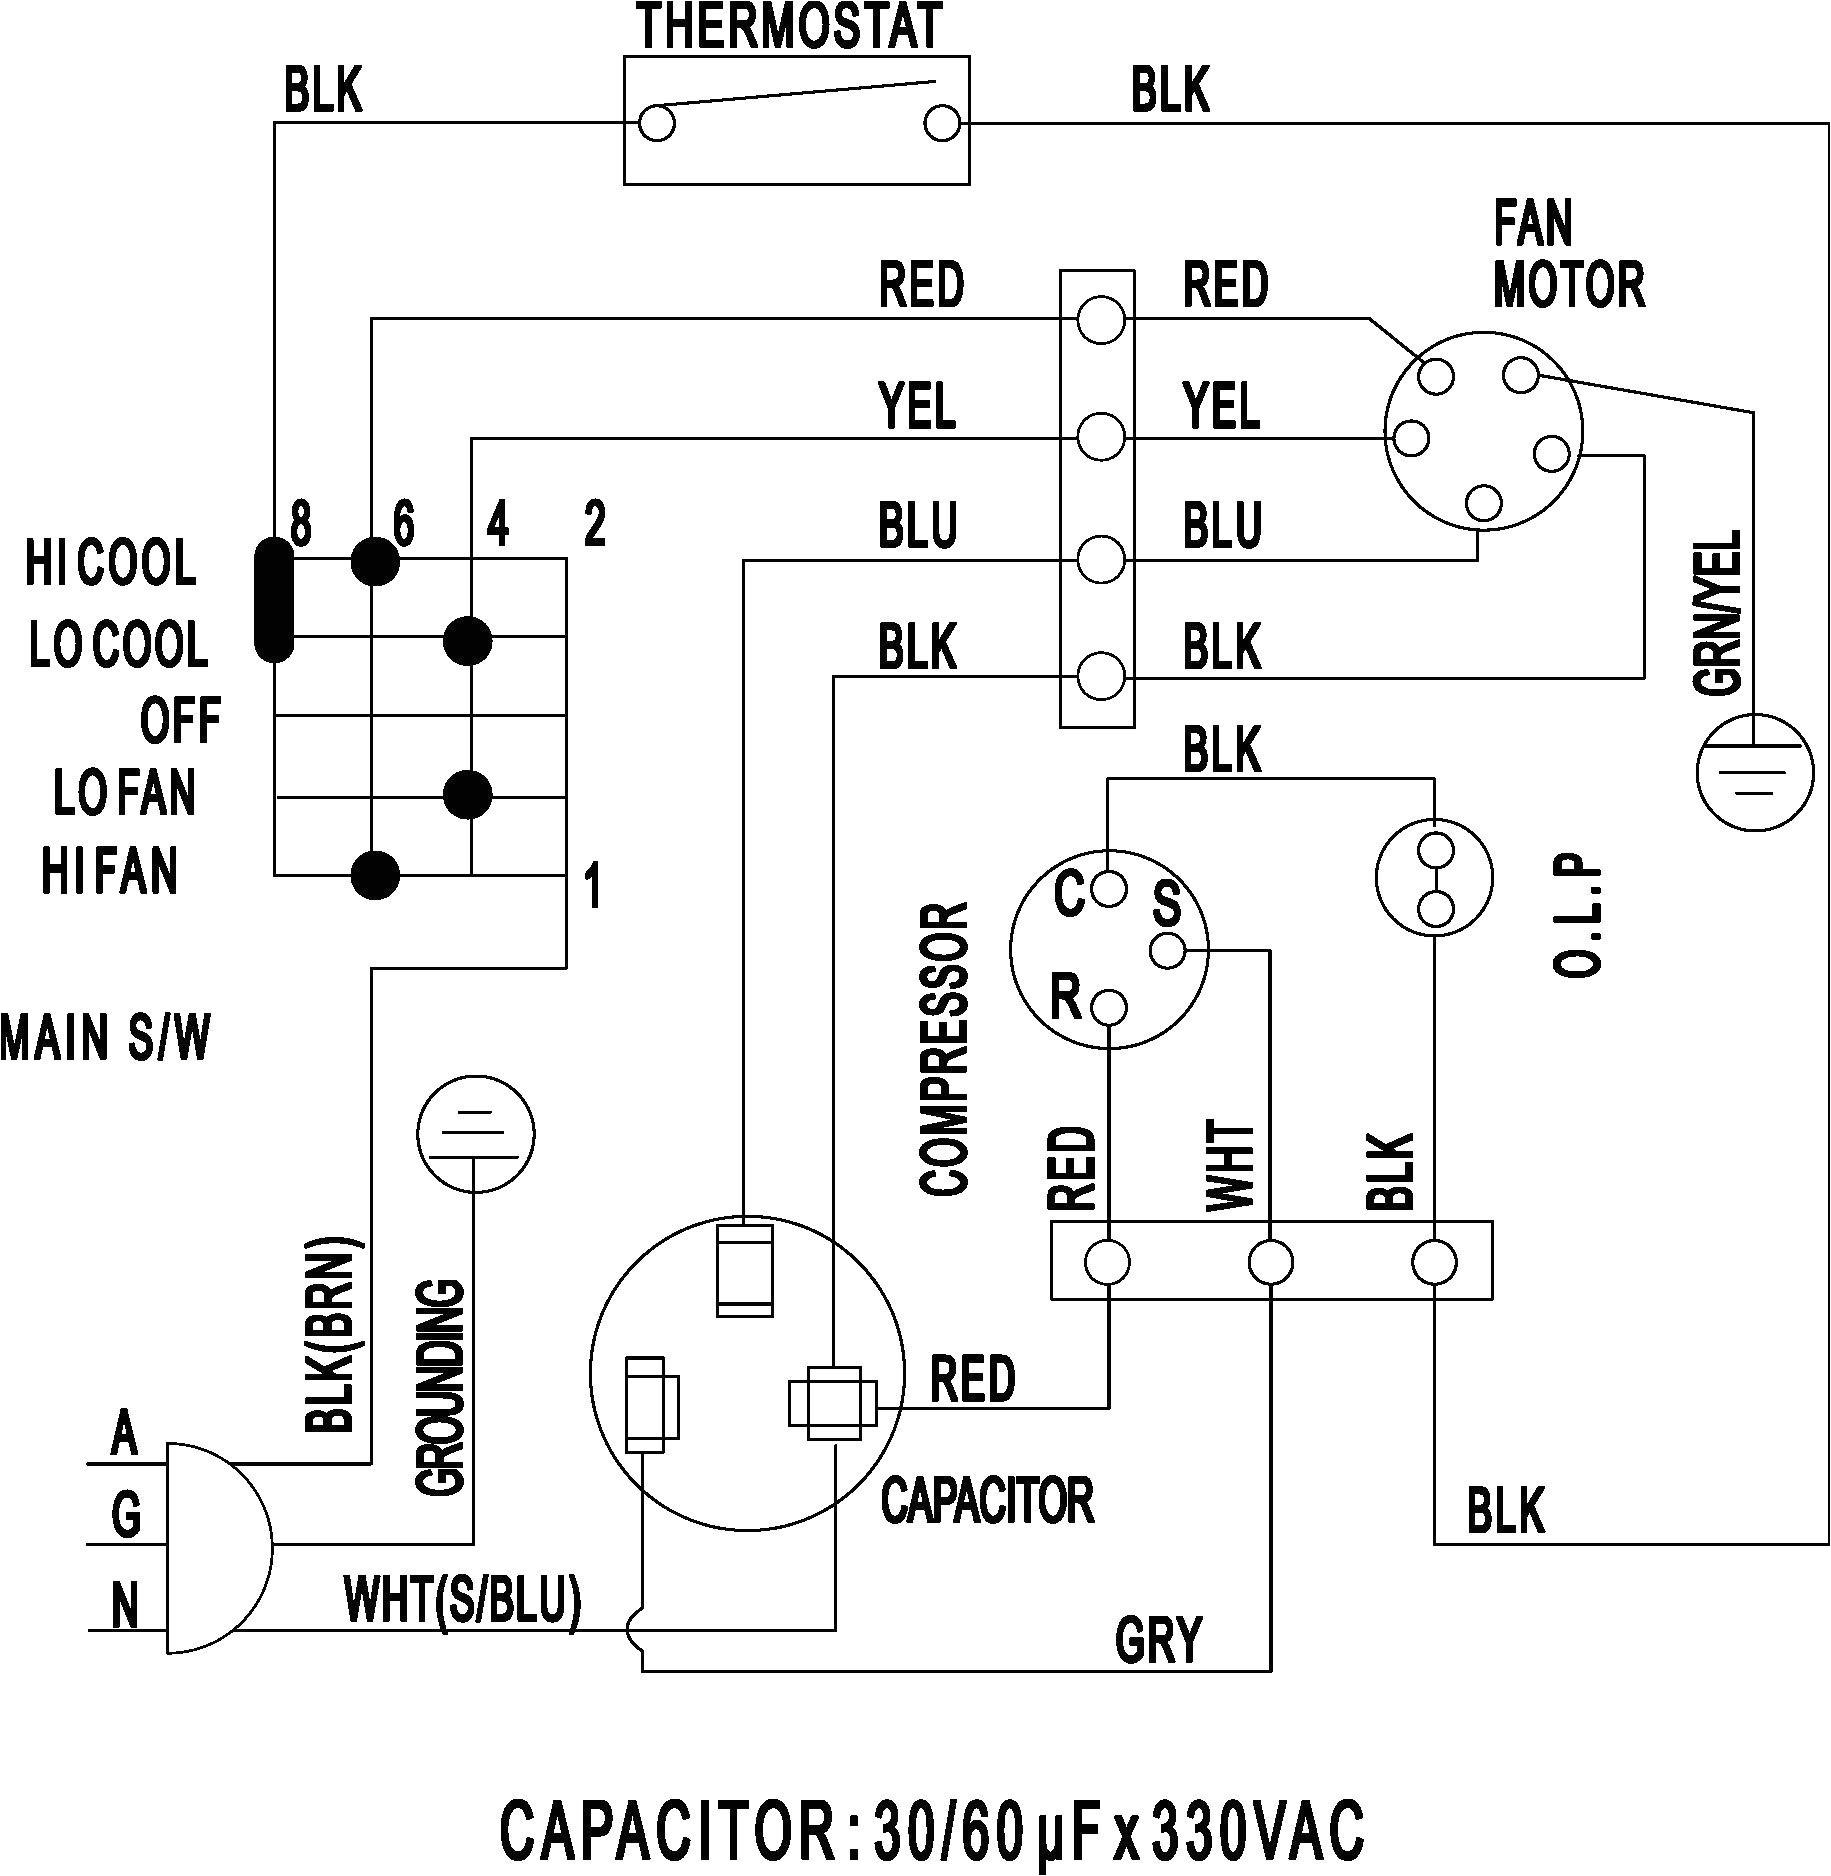 ac unit wiring diagram wiring diagram database mix split air conditioner wiring diagram sample carrier